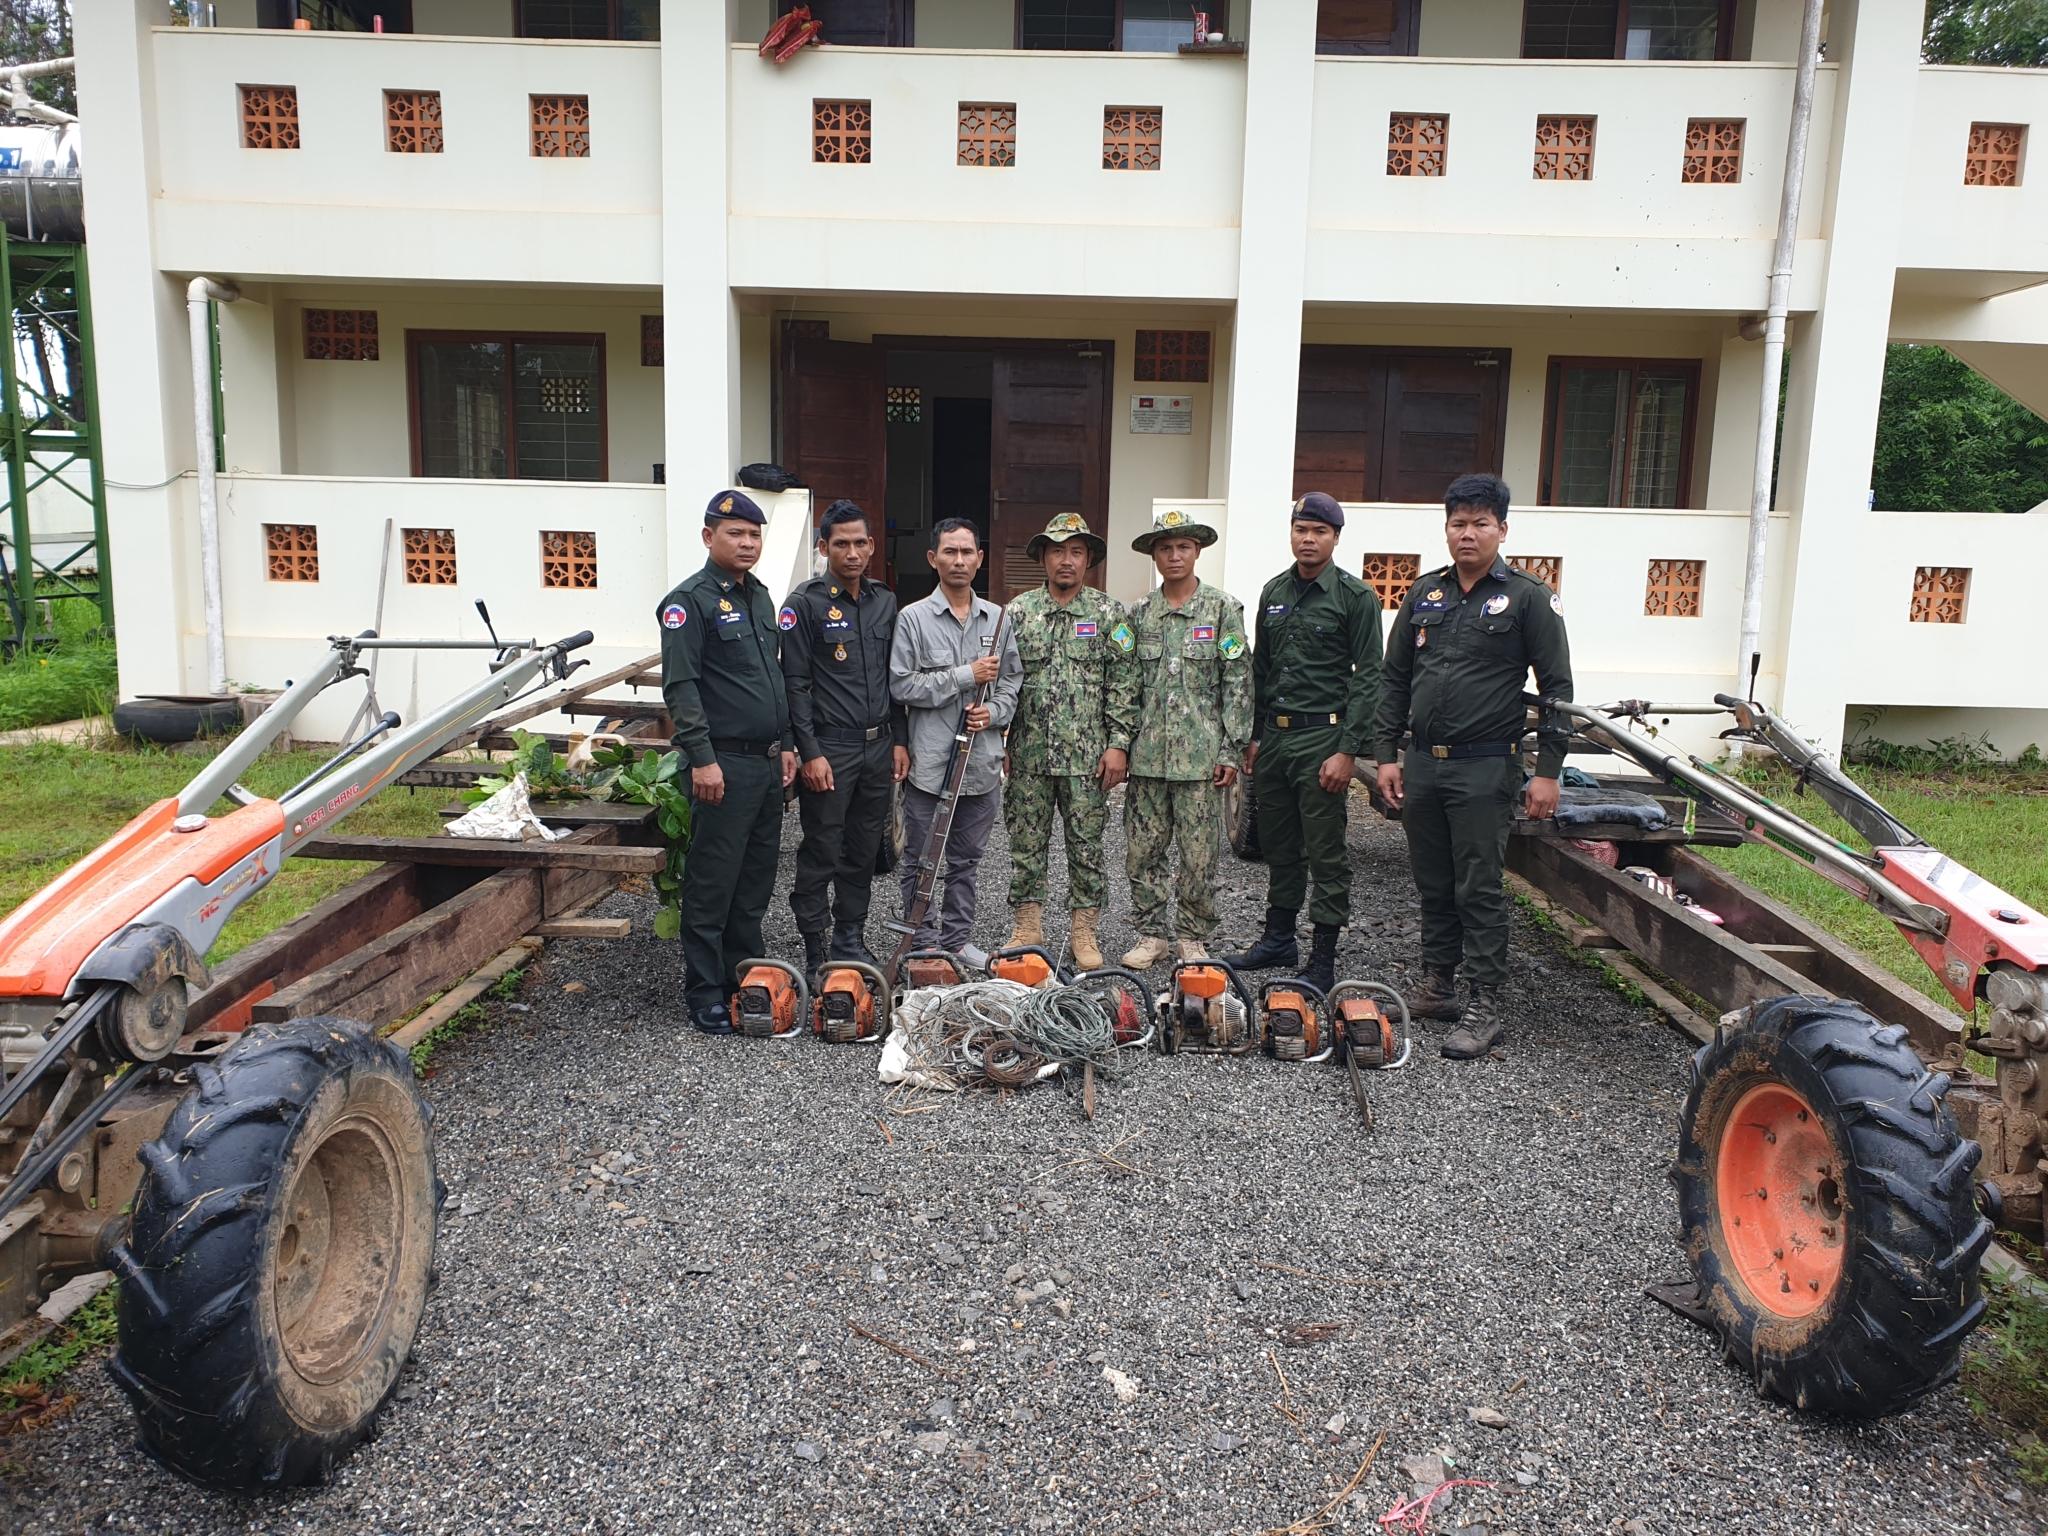 Wildlife Alliance Rangers Cardamom